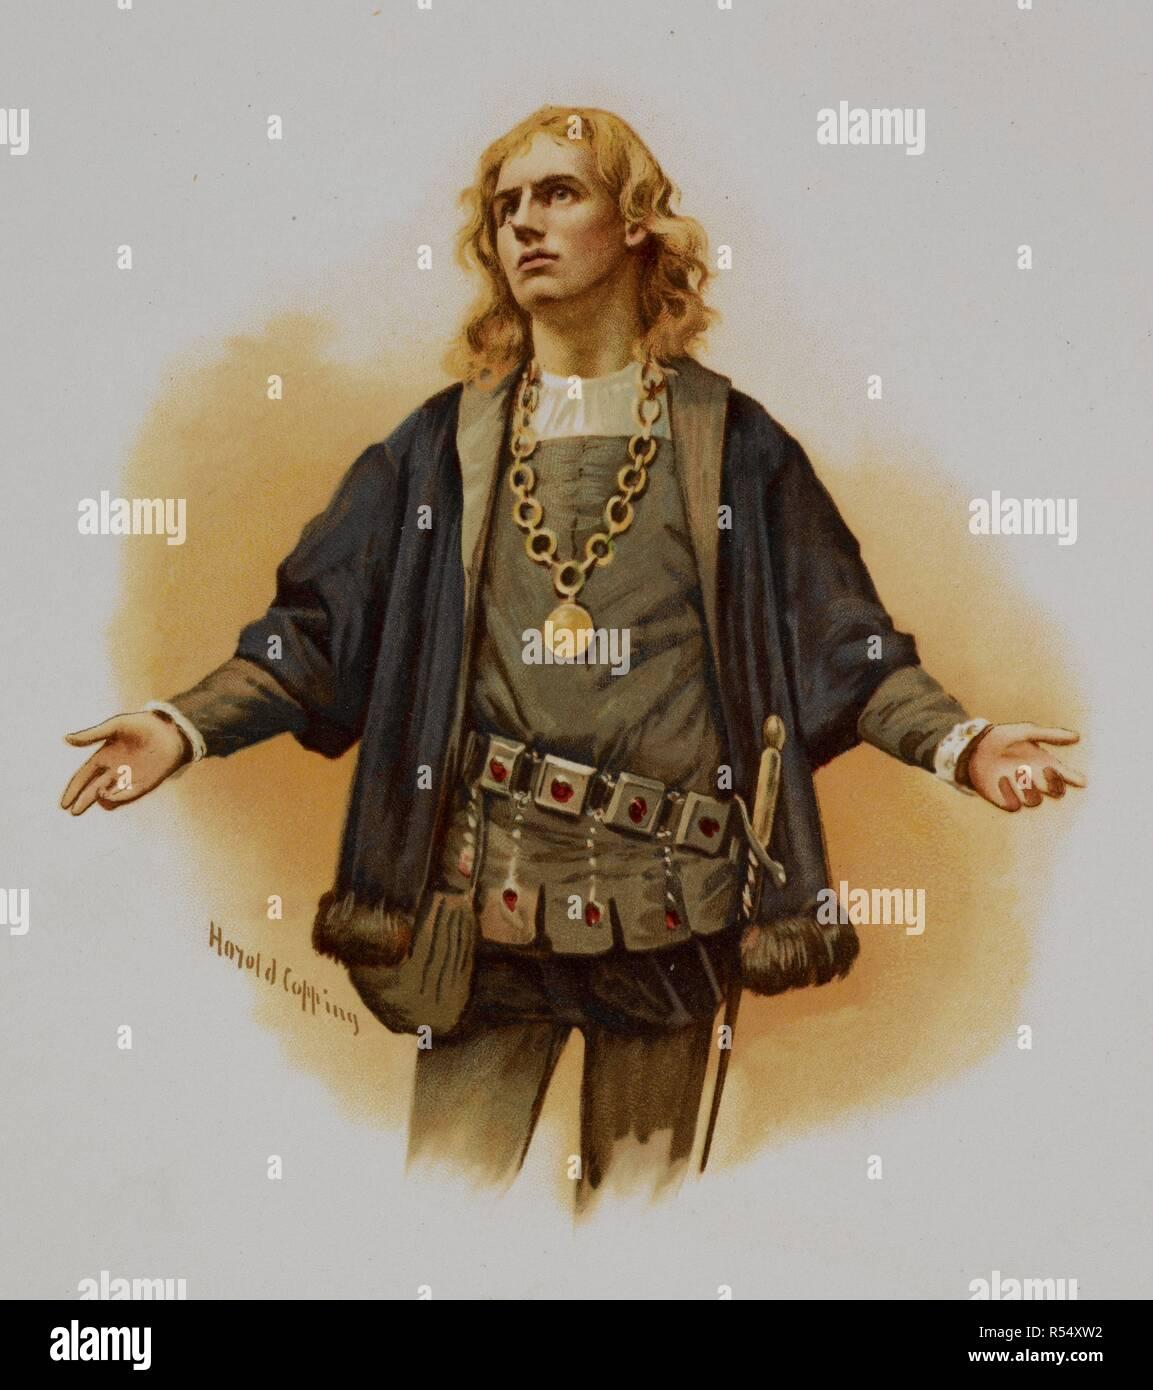 William Shakespeare Colour Portrait High Resolution Stock